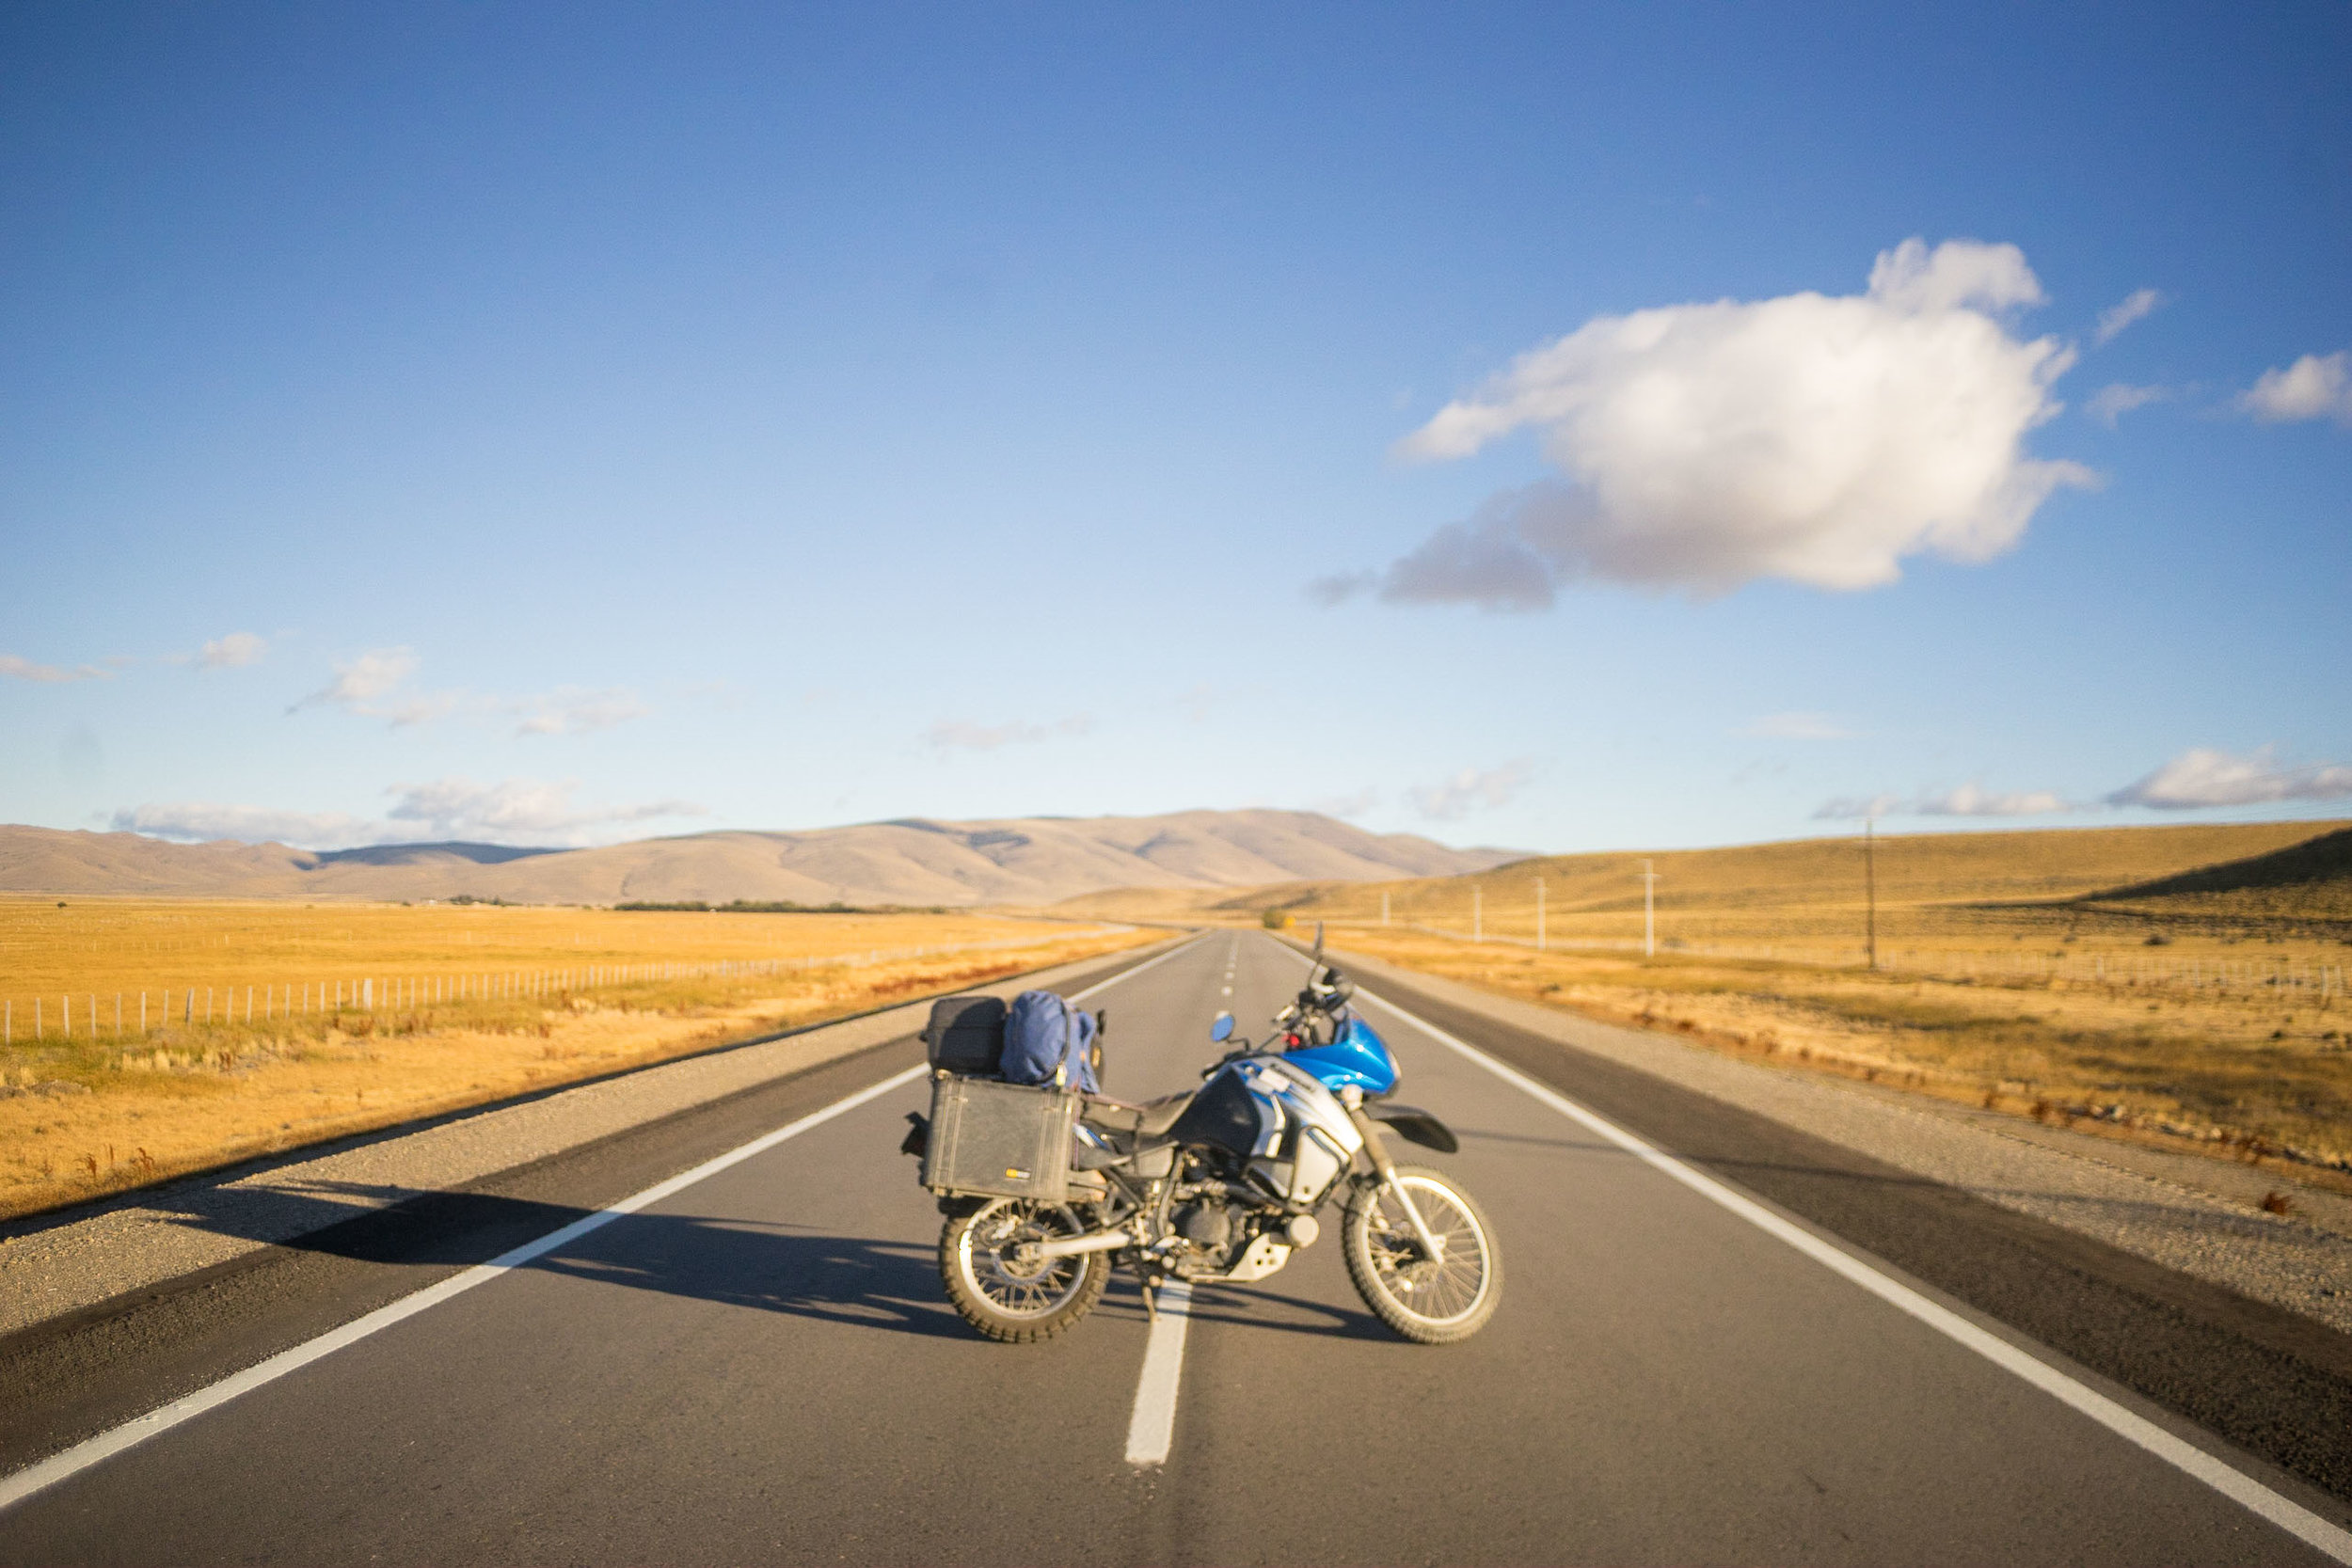 SORRY MUM - We bought motorbikes